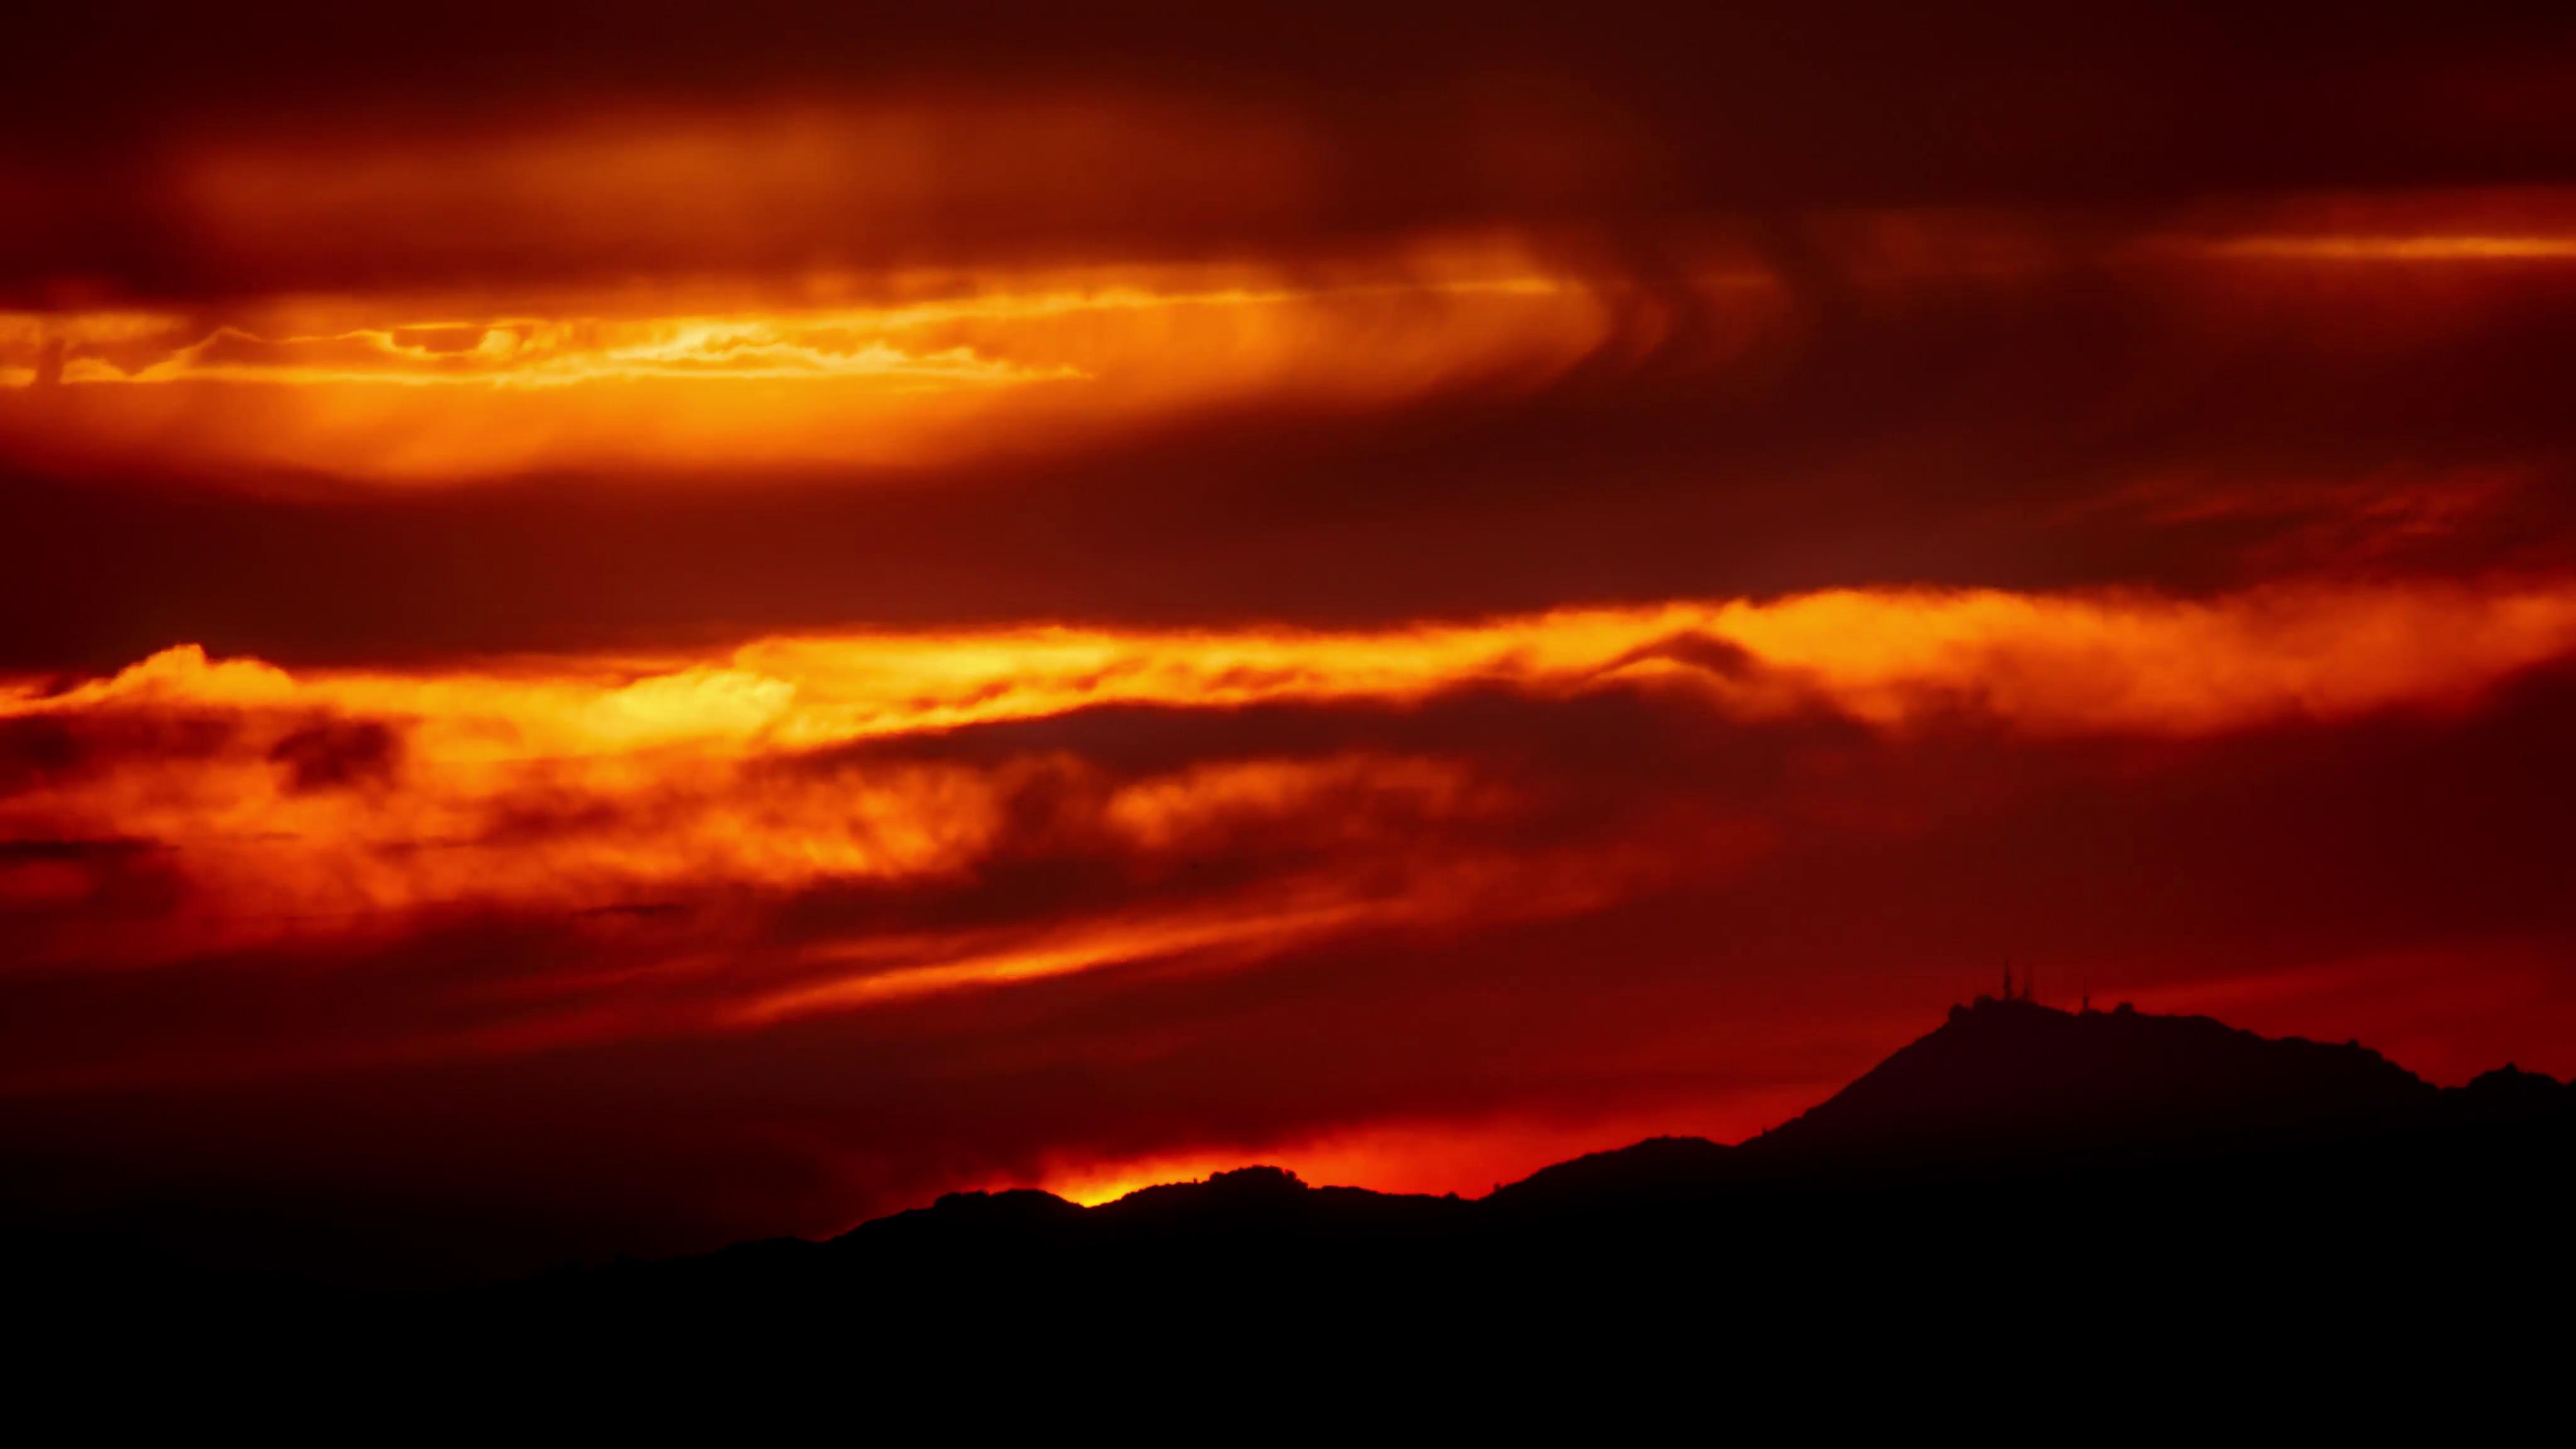 4K. Beautiful scenic dramatic fiery orange sunset sky background ...